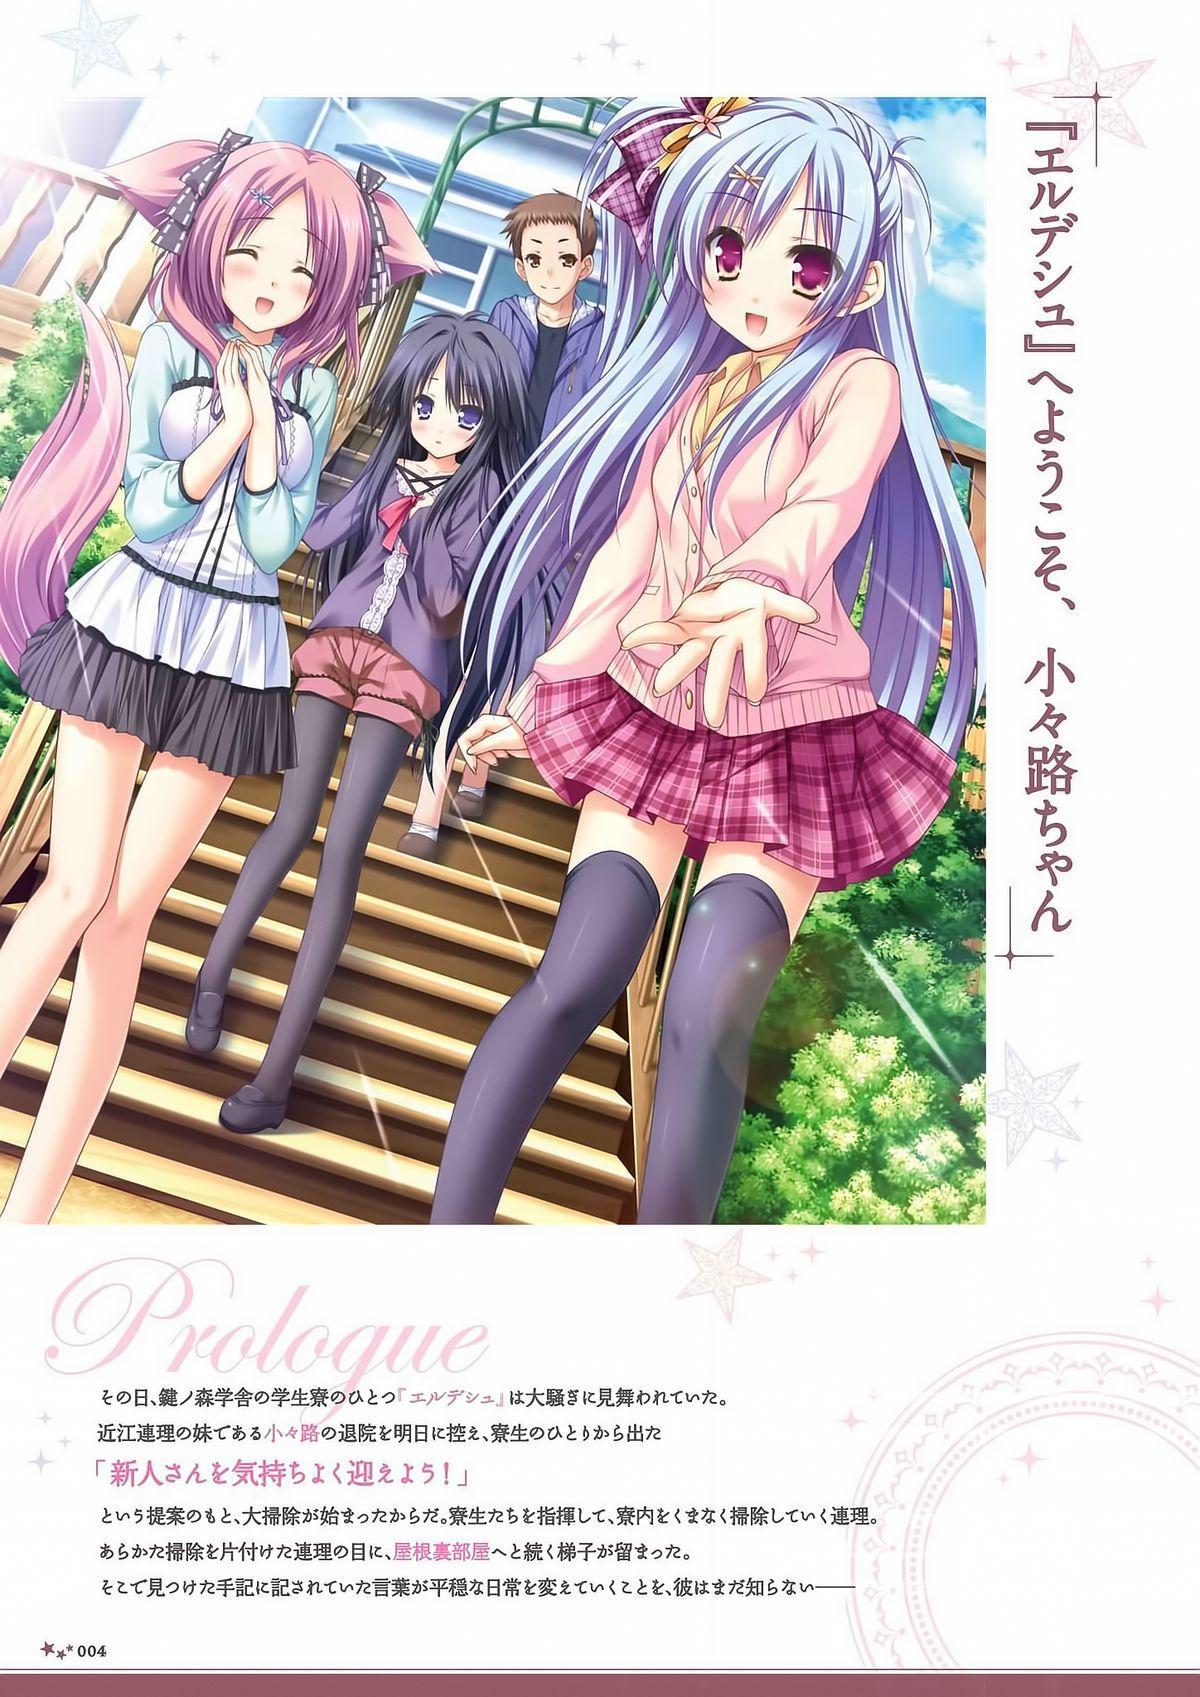 Sekai to Sekai no Mannaka de Visual Fanbook 5